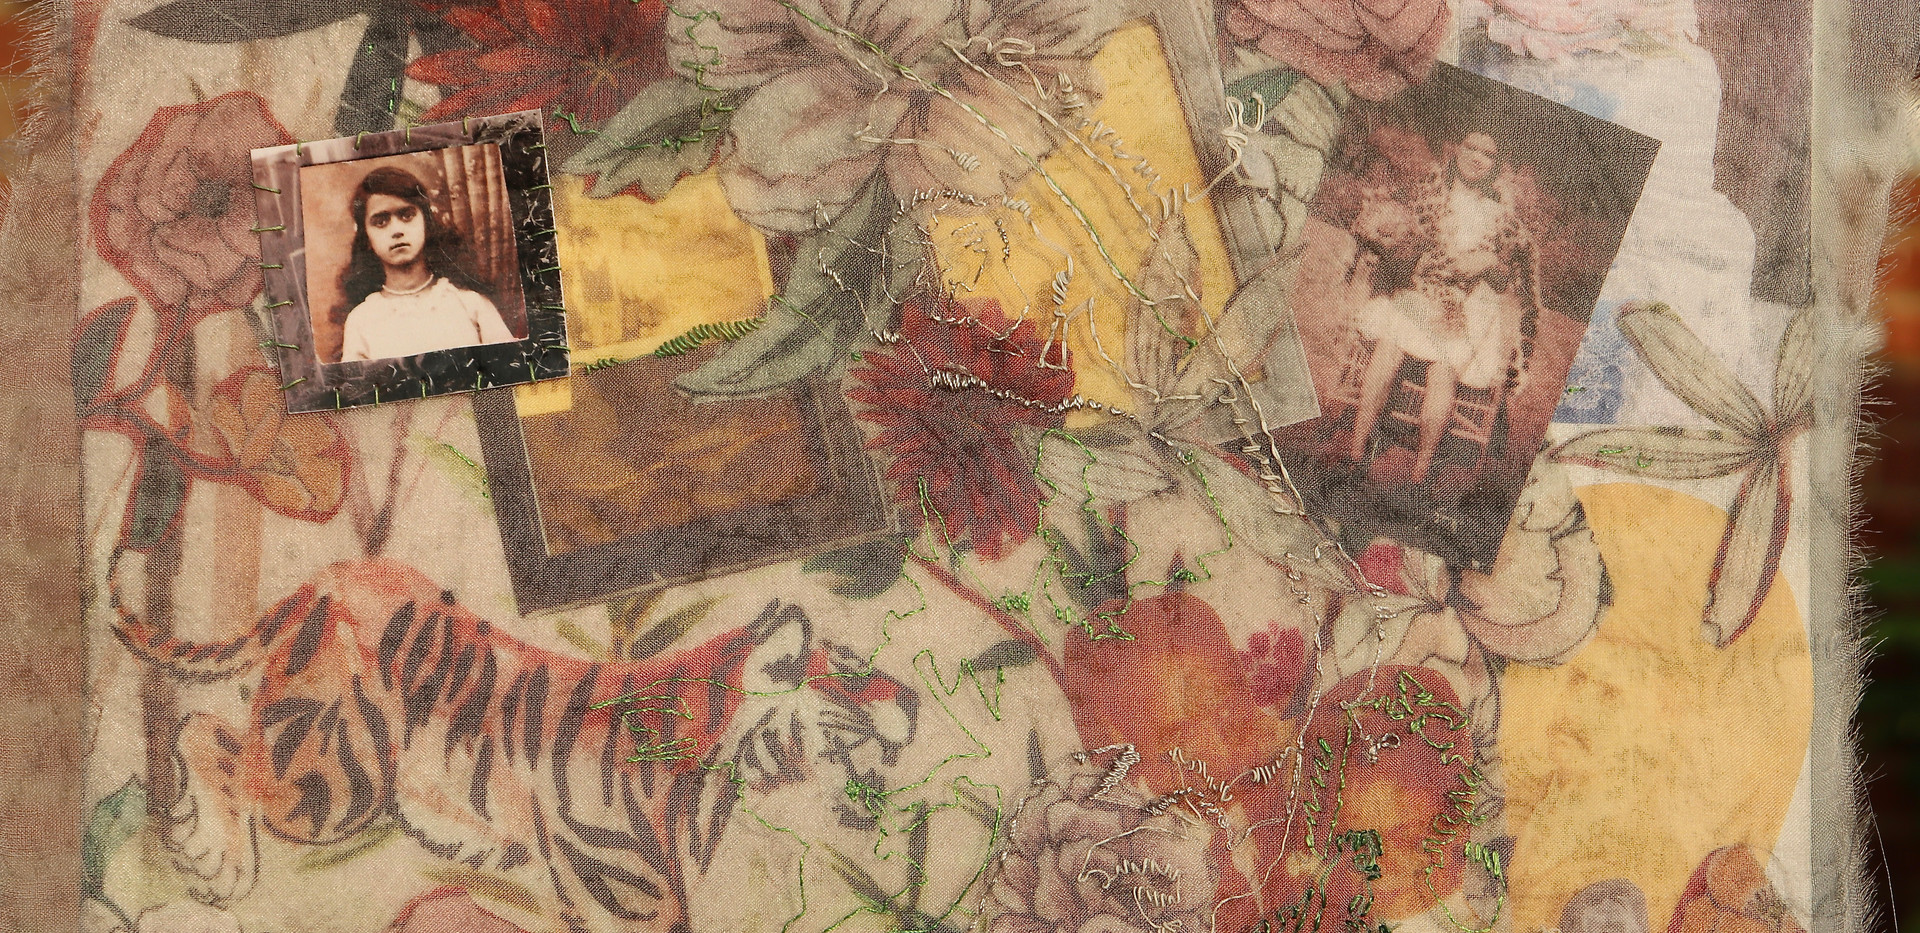 Collage by Bernadine Jones